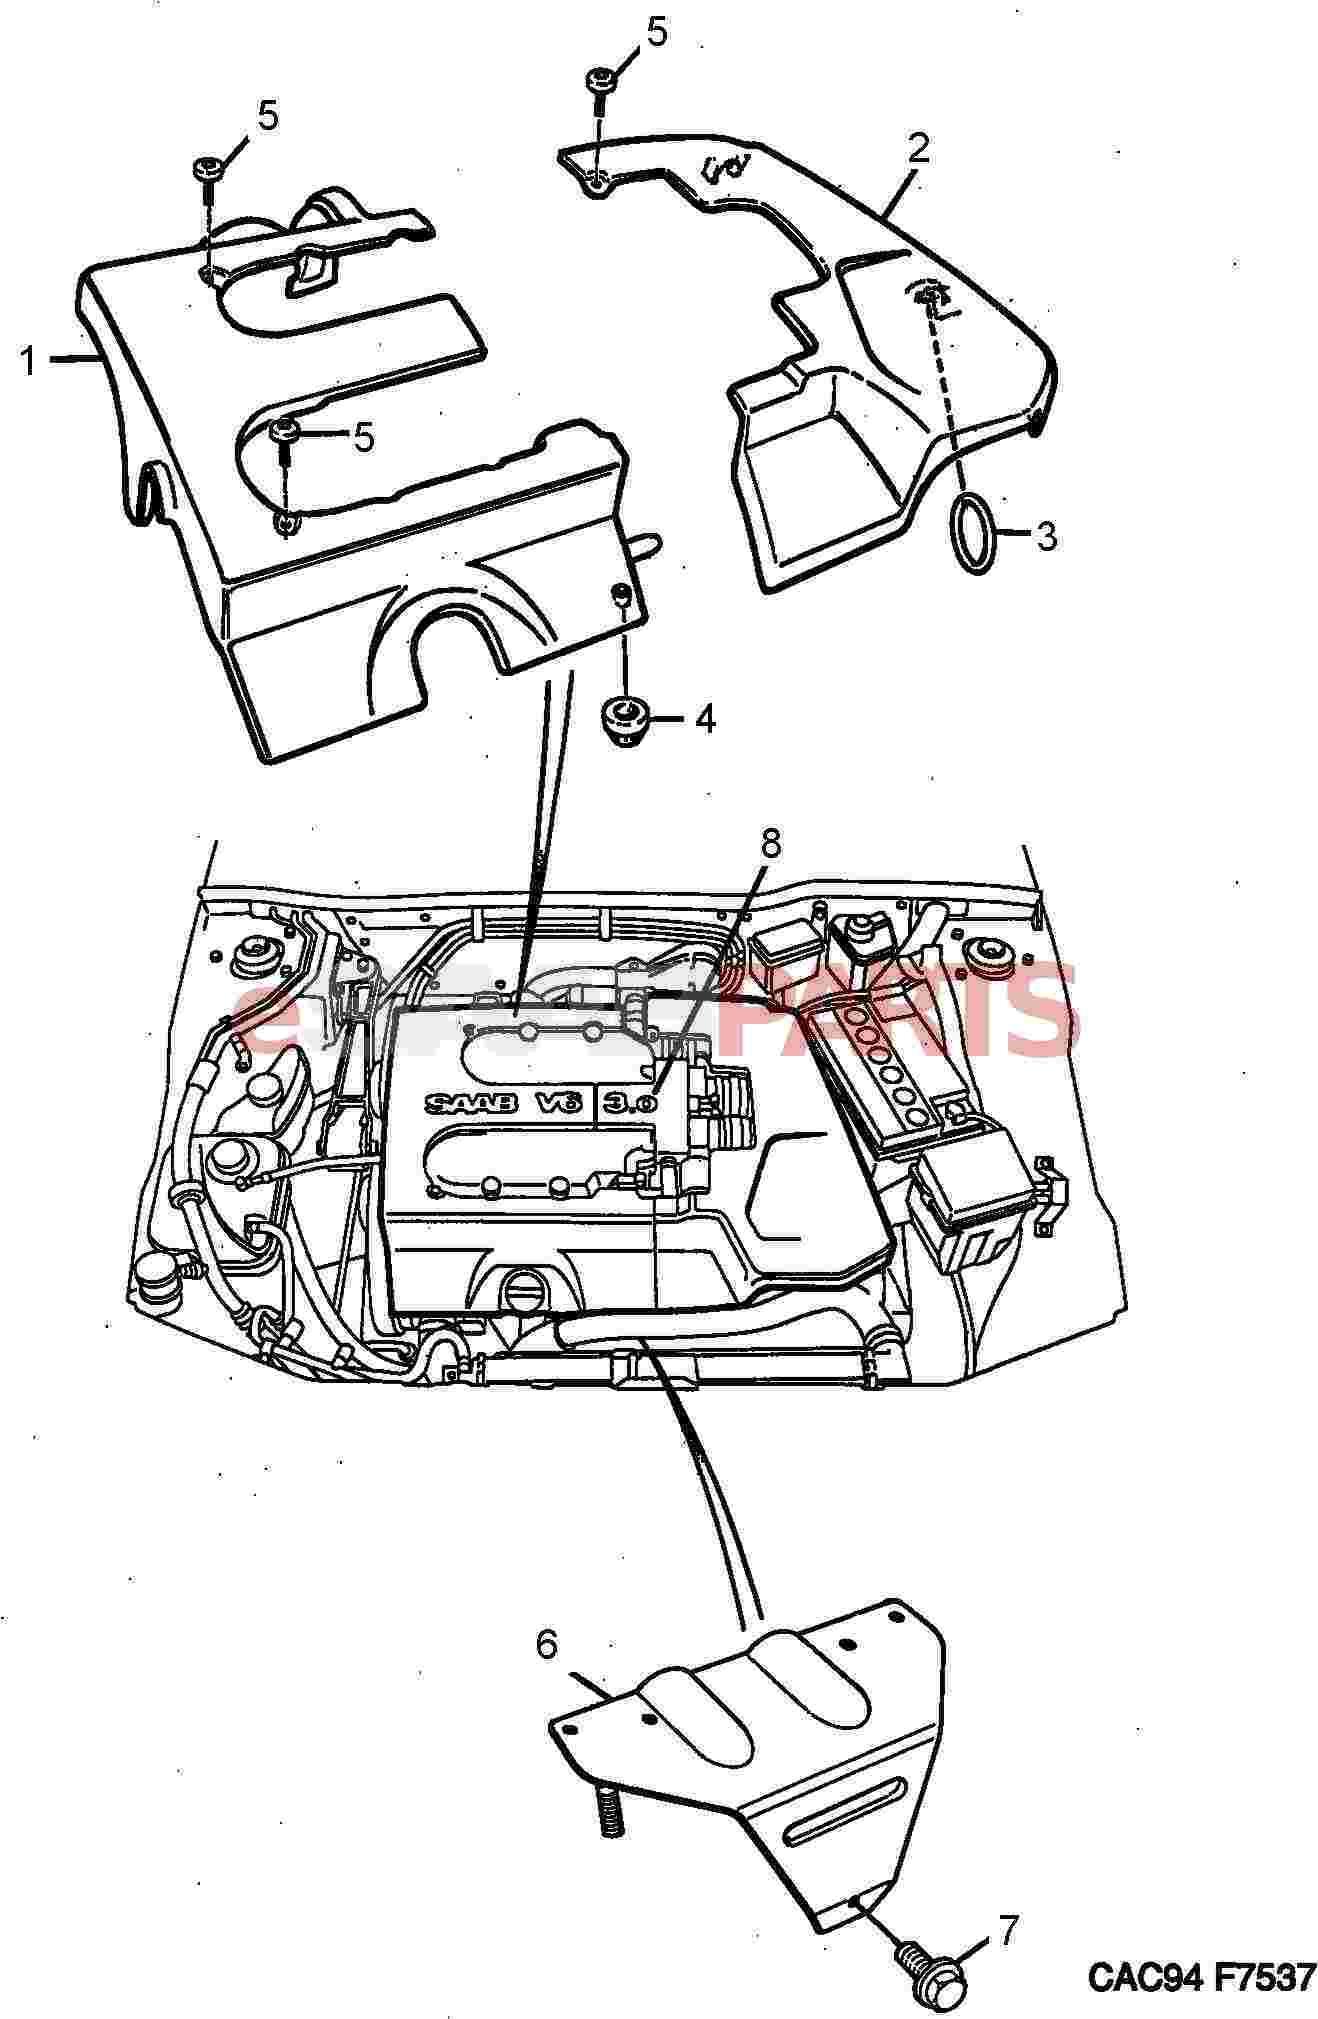 tags: #rear mid engine rear wheel drive layout#front engine rear wheel  drive layout#1947 fwd fire truck#nissan sr20 engine#mid engine front wheel  drive